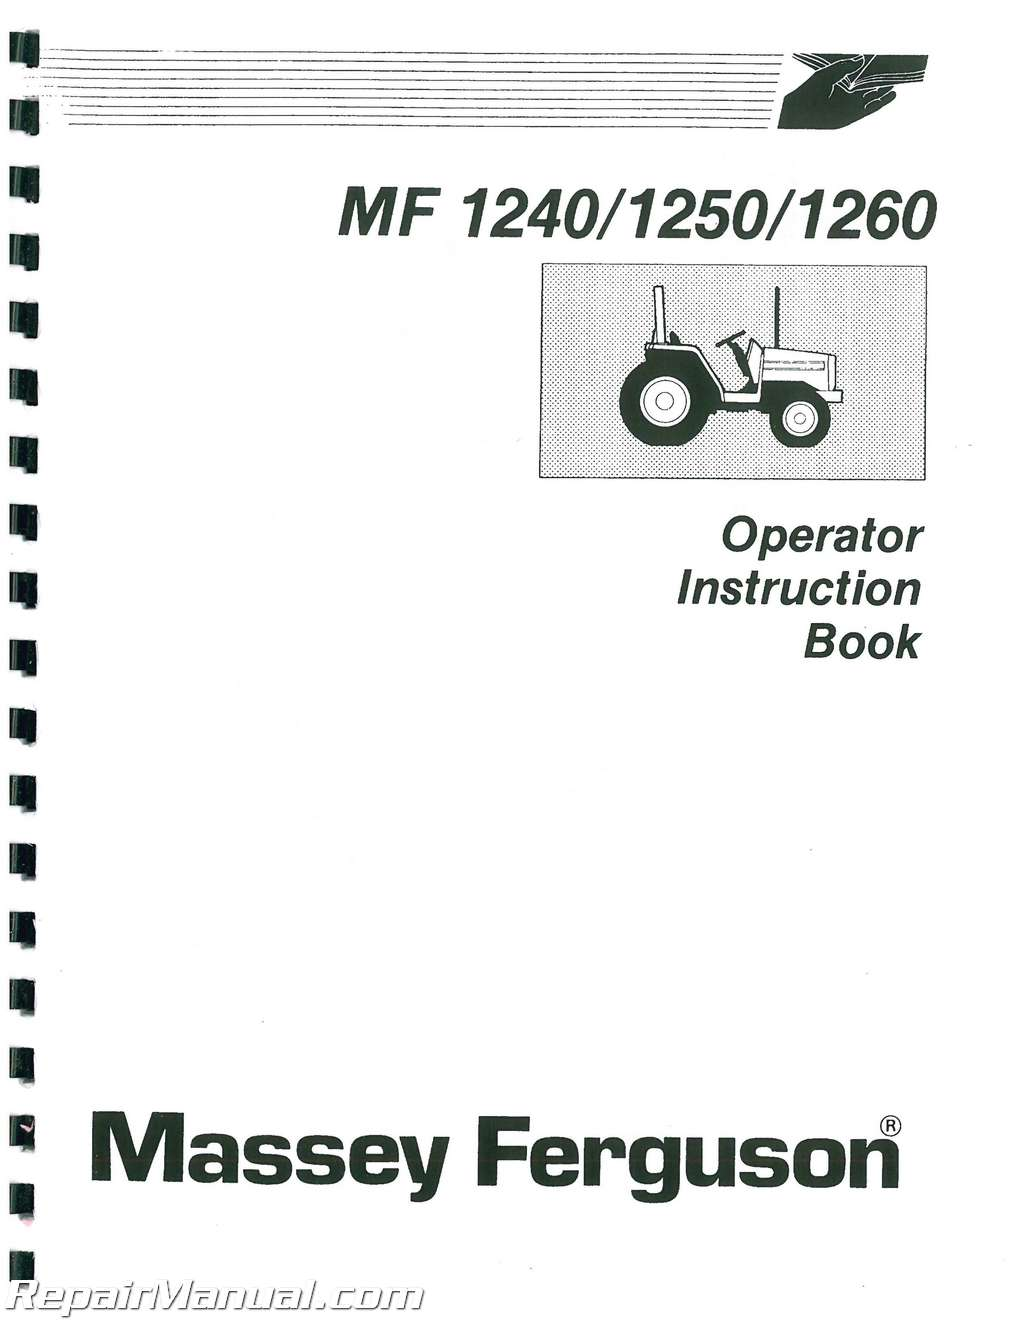 massey ferguson 1240 compact tractor operators manual rh repairmanual com massey ferguson 1540 manual massey ferguson 1240 operators manual